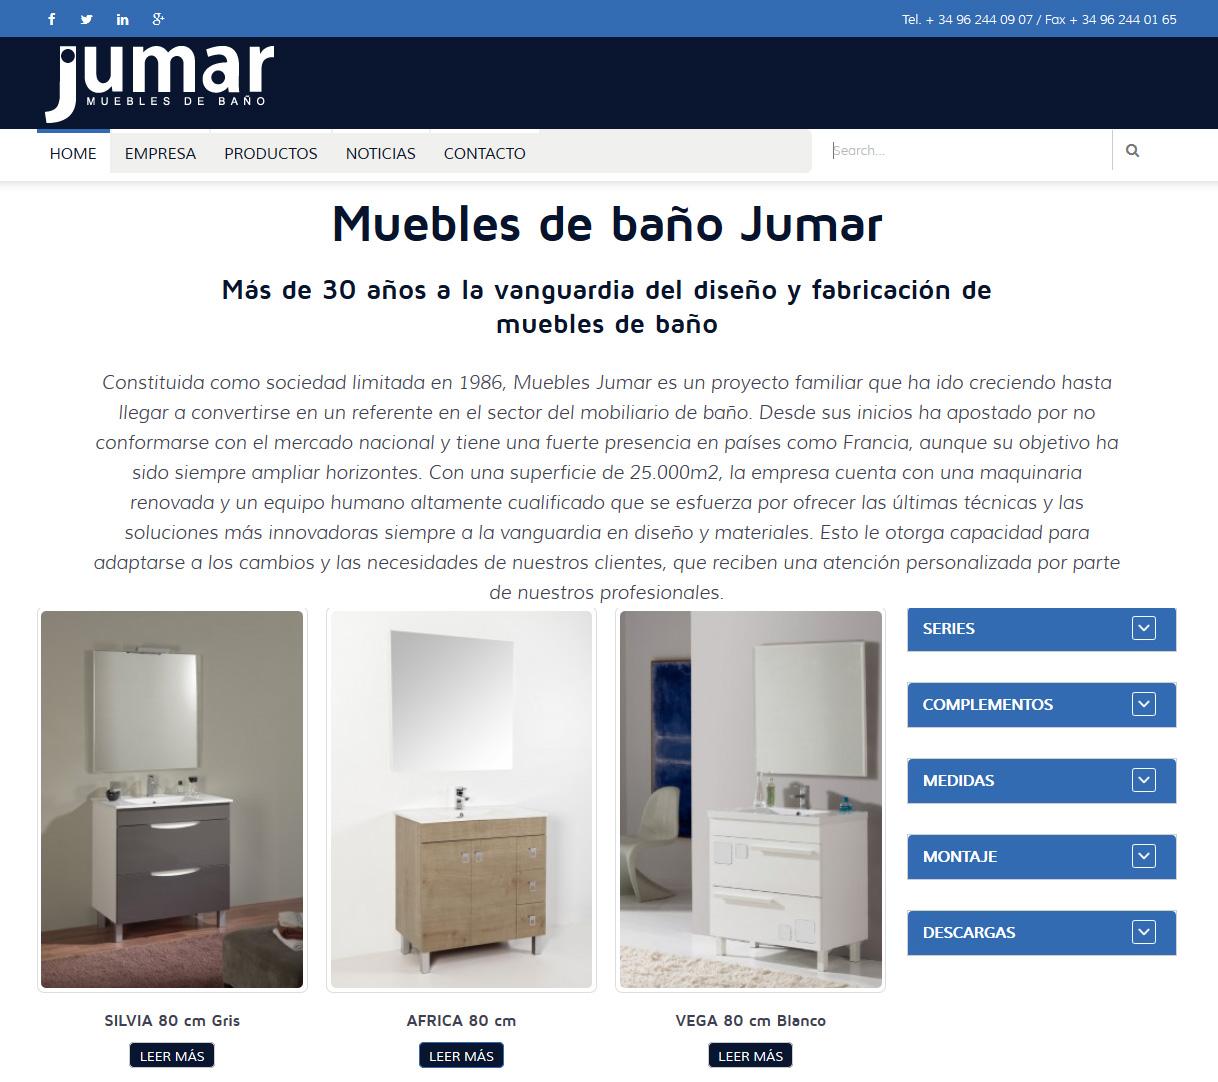 MUEBLES DE BAÑO JUMAR